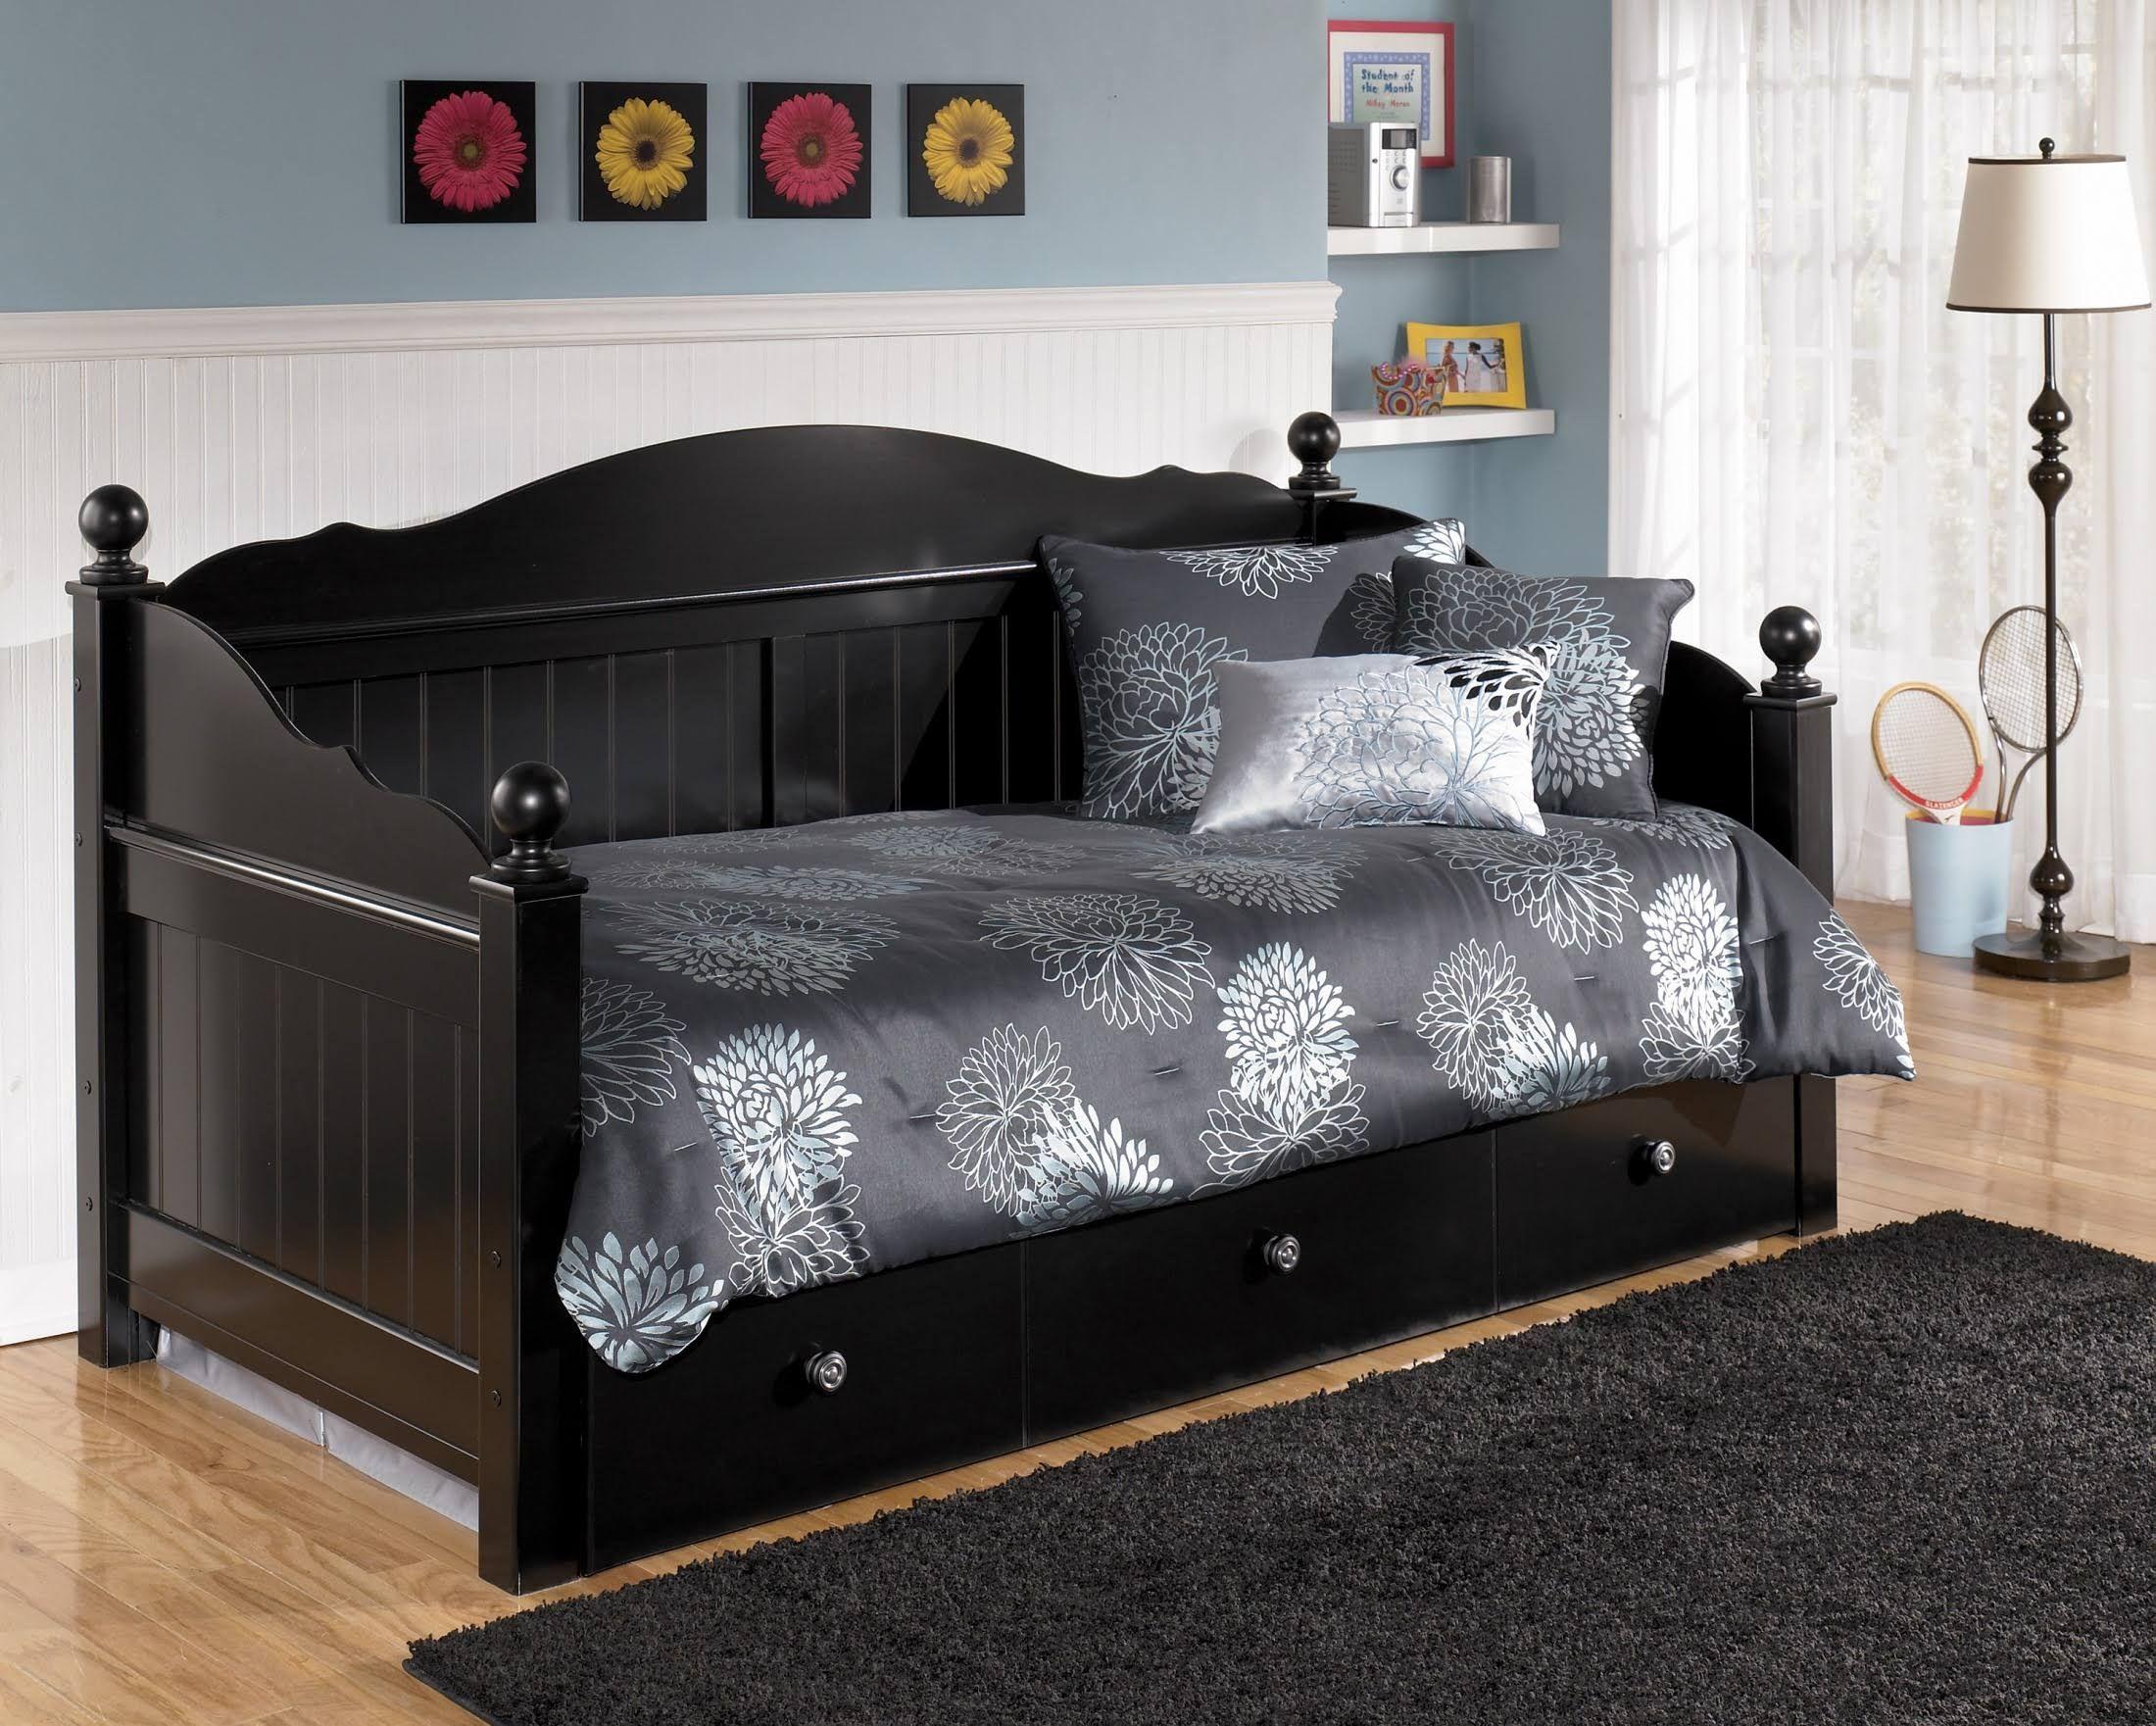 Ashley Furniture Jaidyn Day Bed with Trundle Ashley